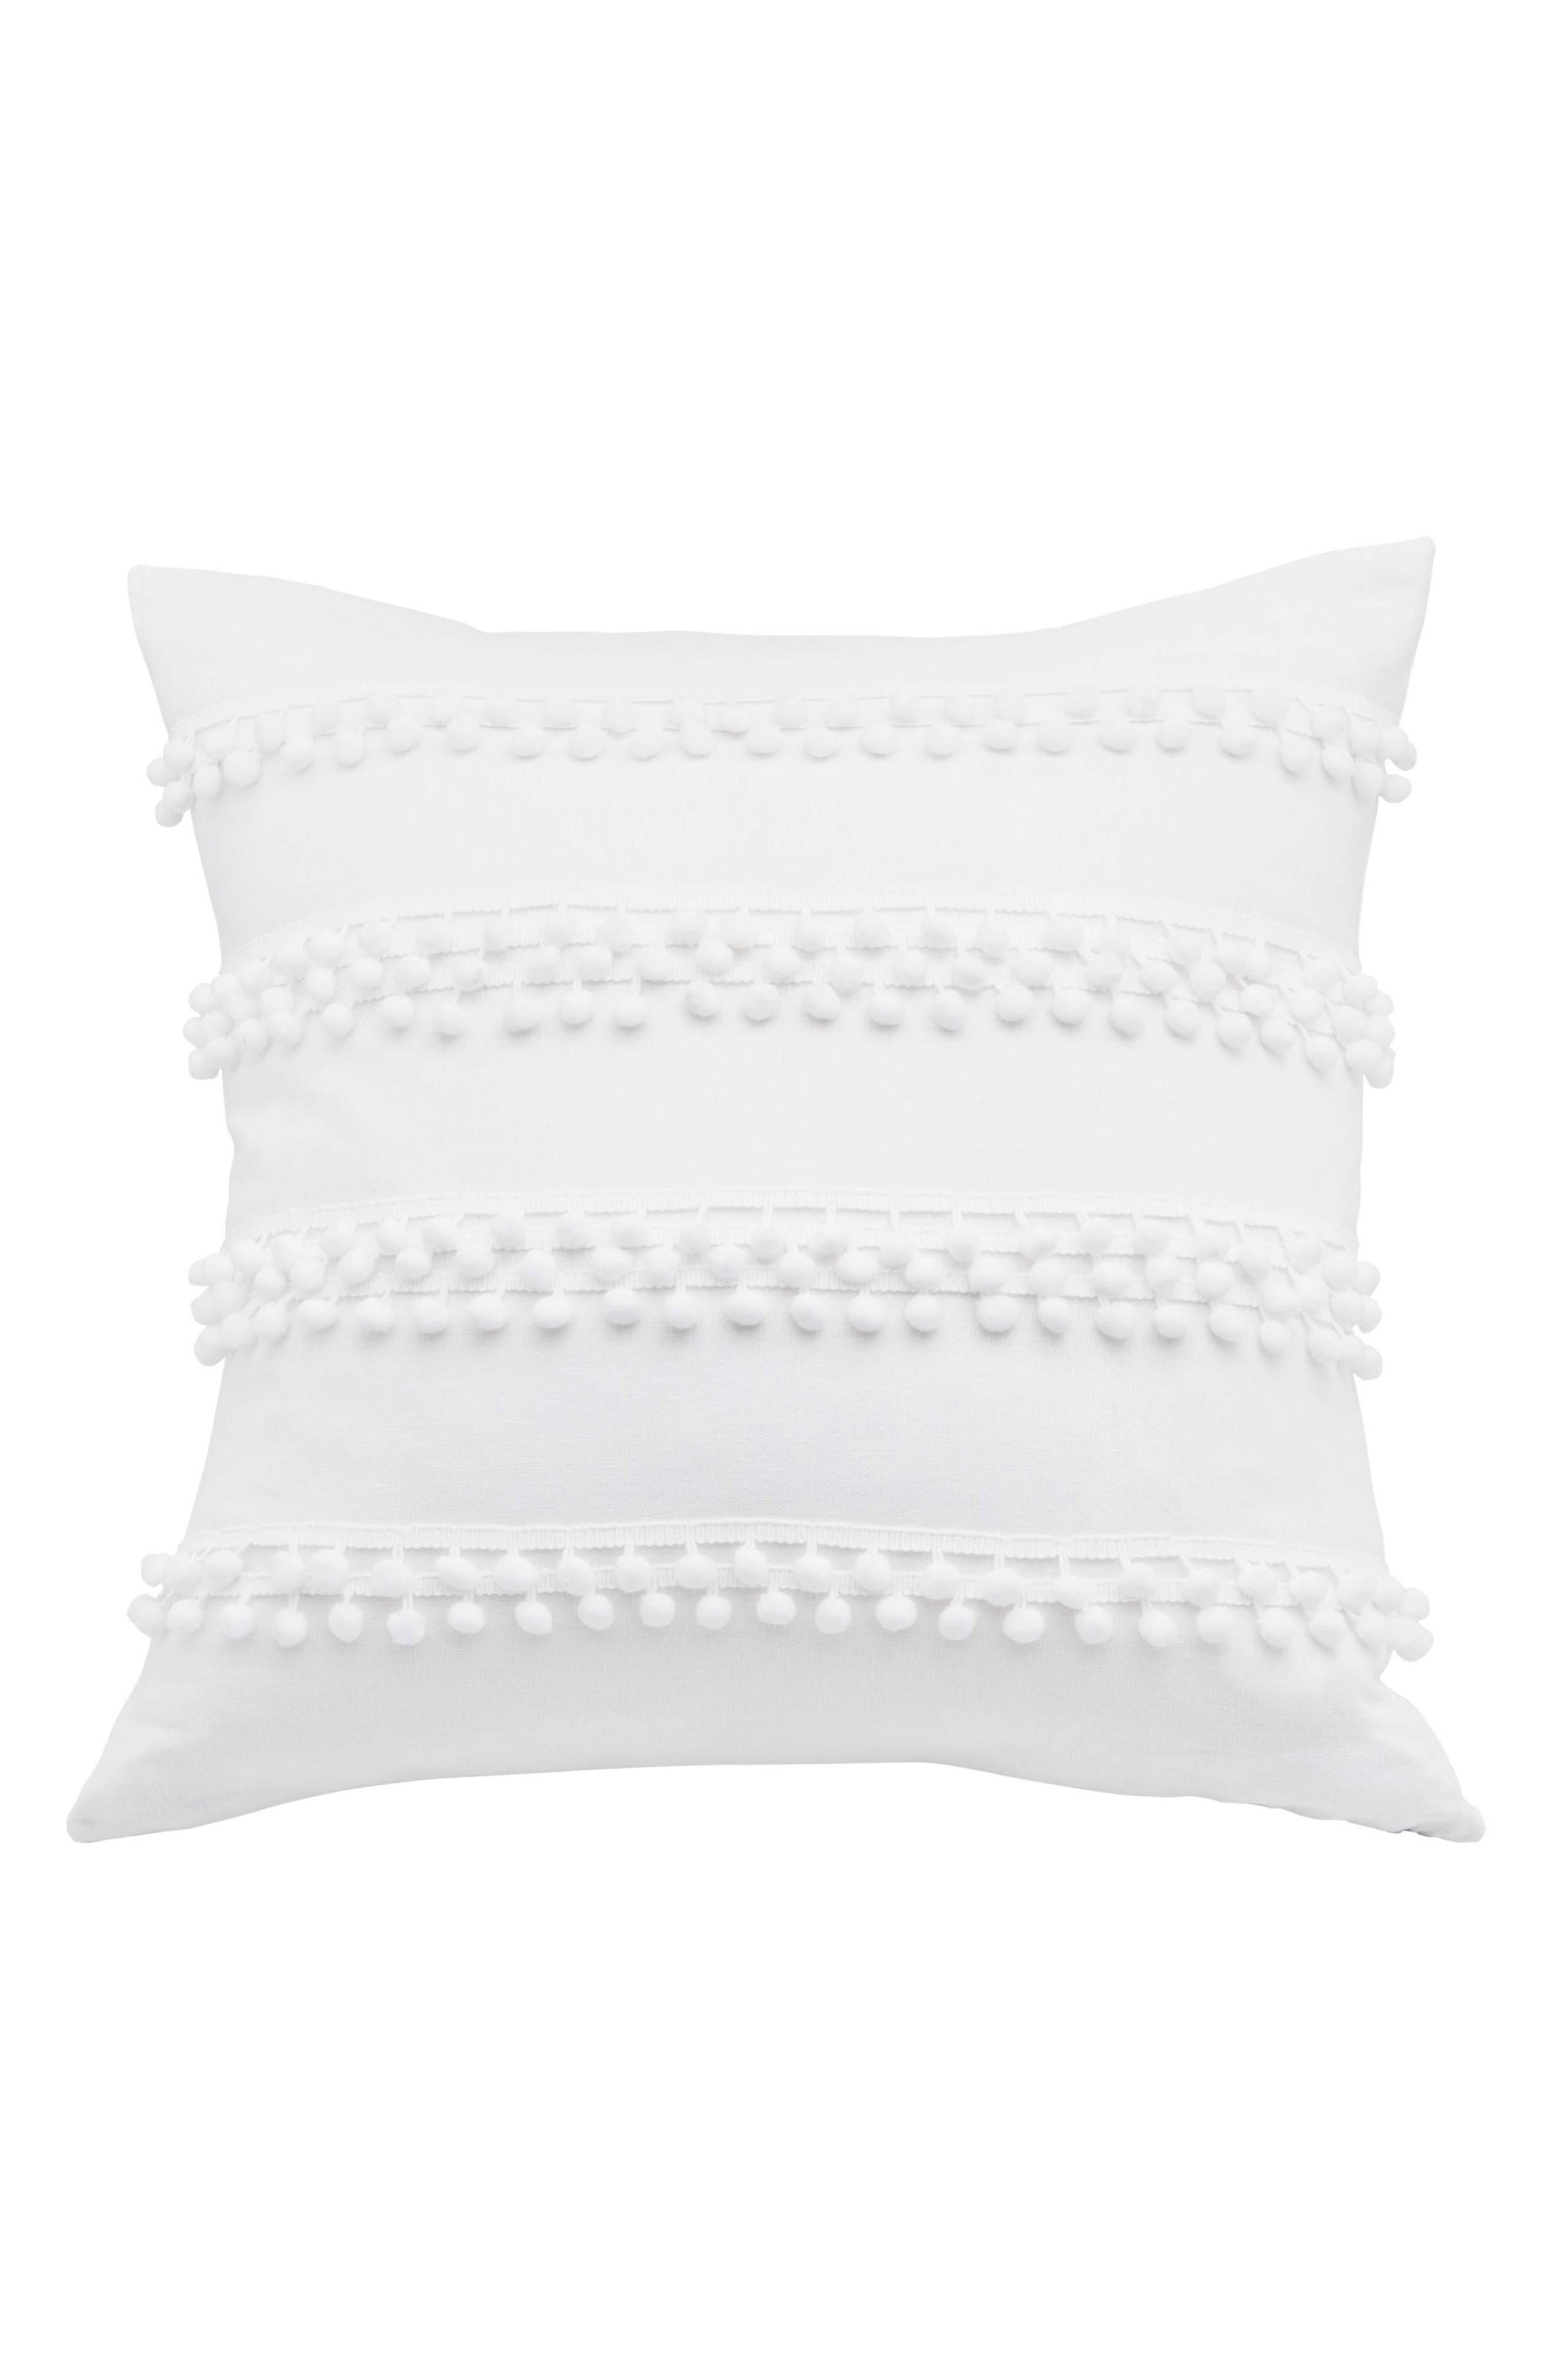 Pompom Square Pillow,                             Main thumbnail 1, color,                             WHITE